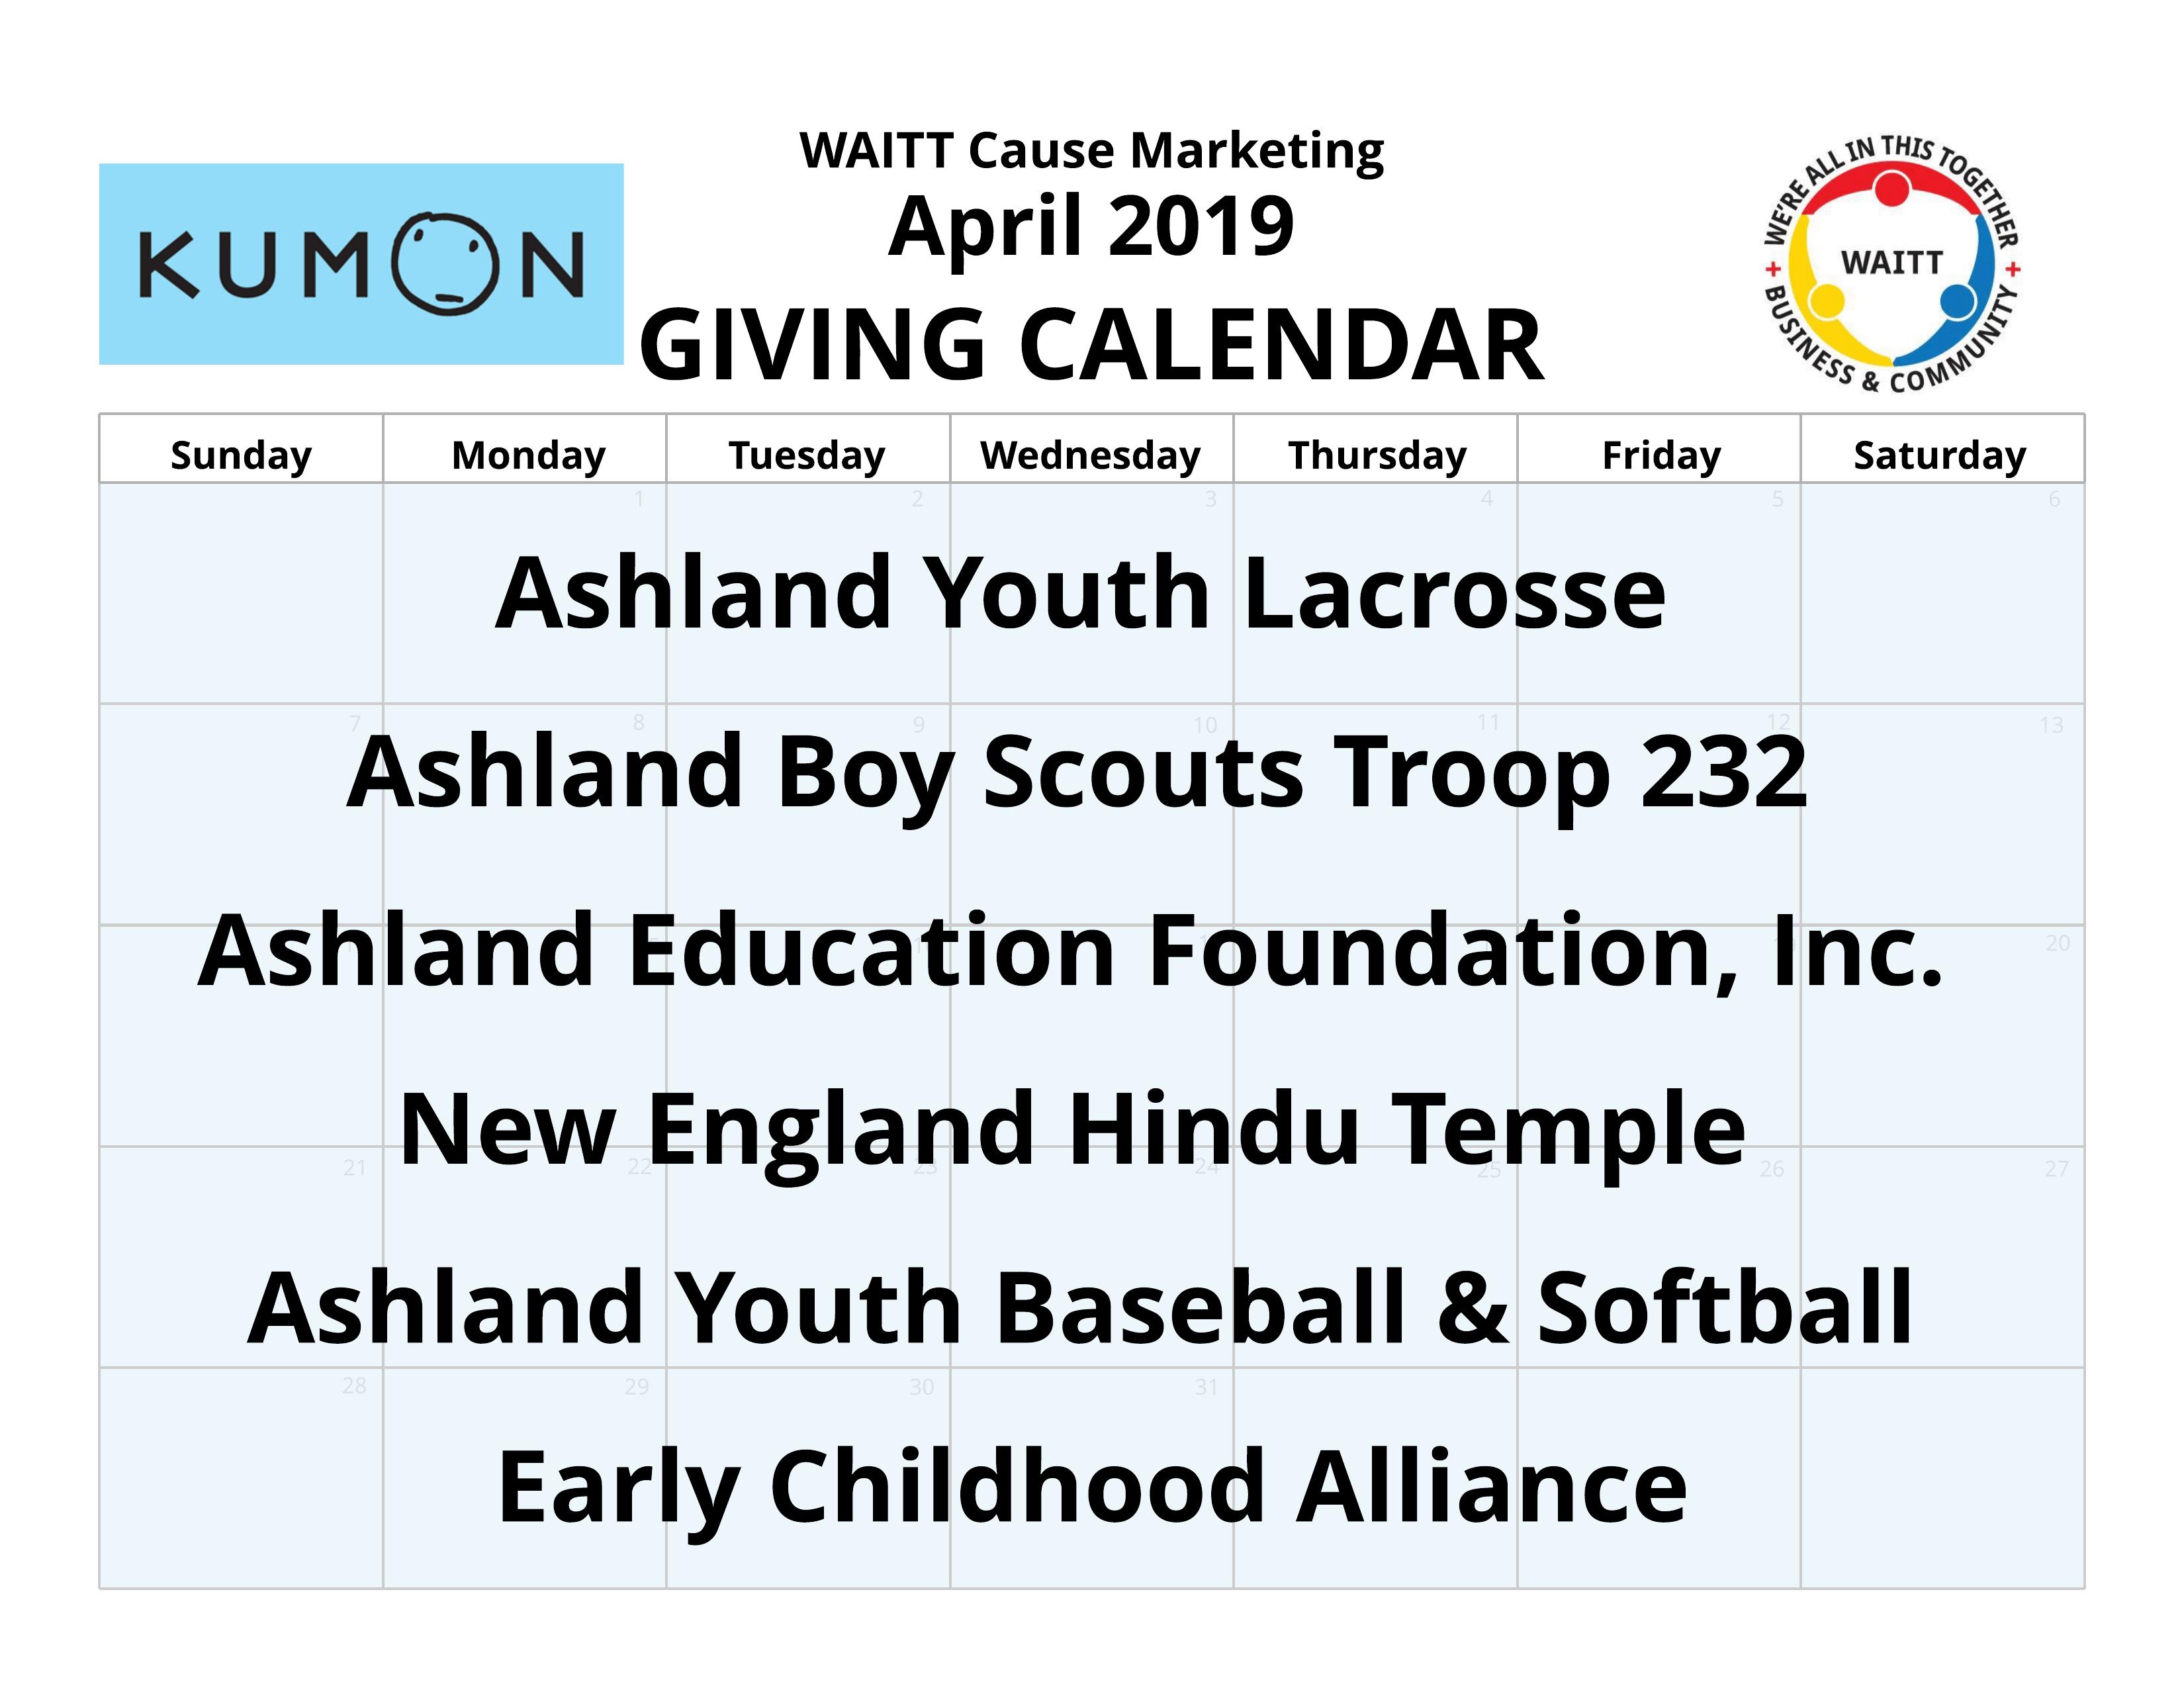 April 2019 Giving Calendars | WAITT Cause Marketing